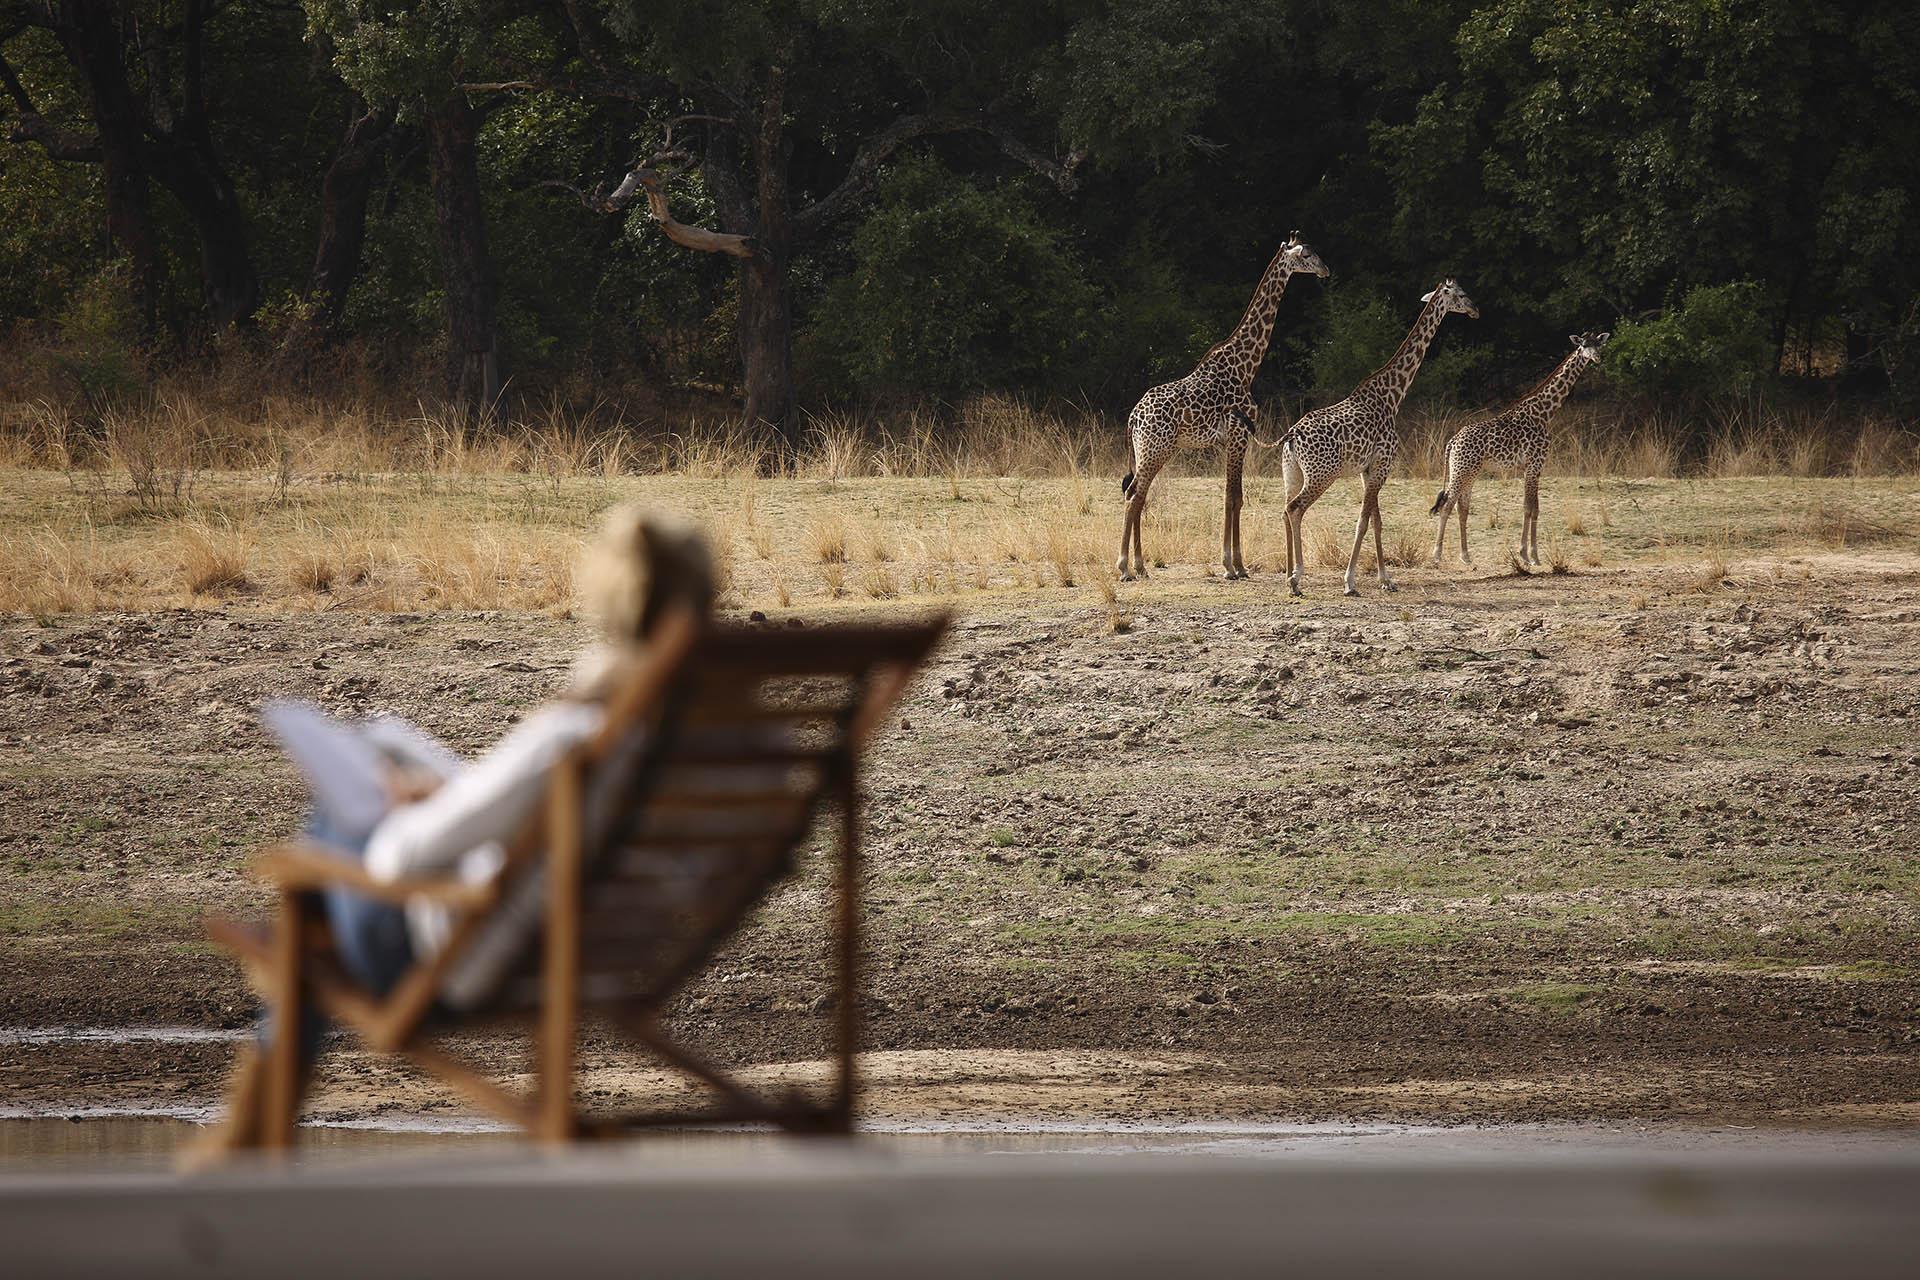 viphya plateau tours malawian-style-malawi-adventures-experiences-specialist-tour-operator-chinzombo-giraffe